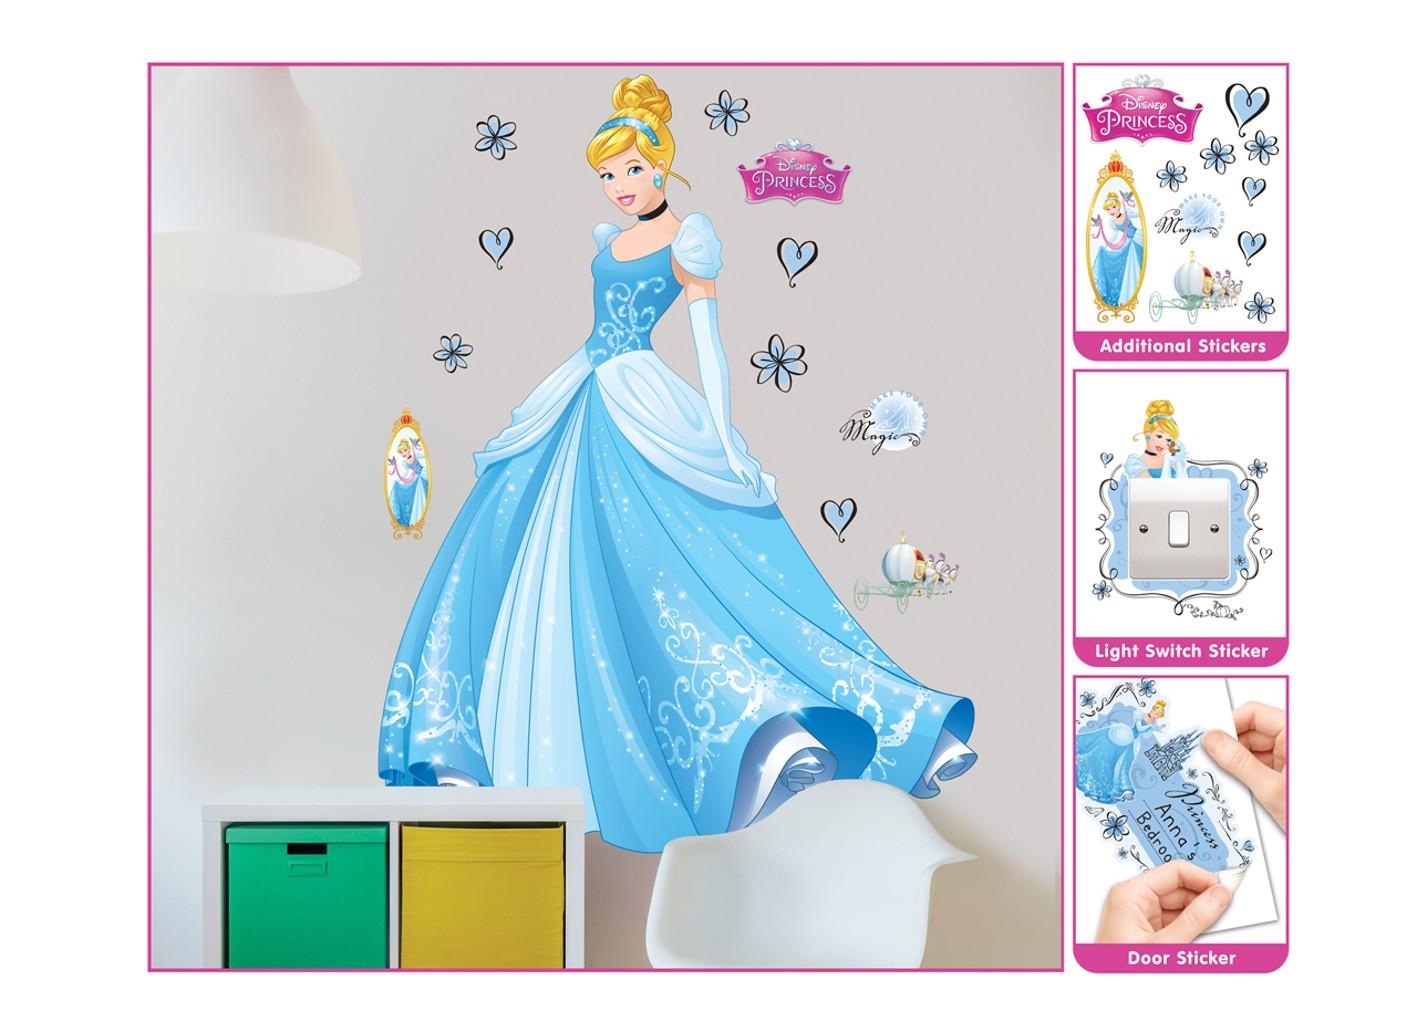 Samolepicí dekorace Walltastic Cinderella 44340 (Sada samolepek do dětského pokoje)